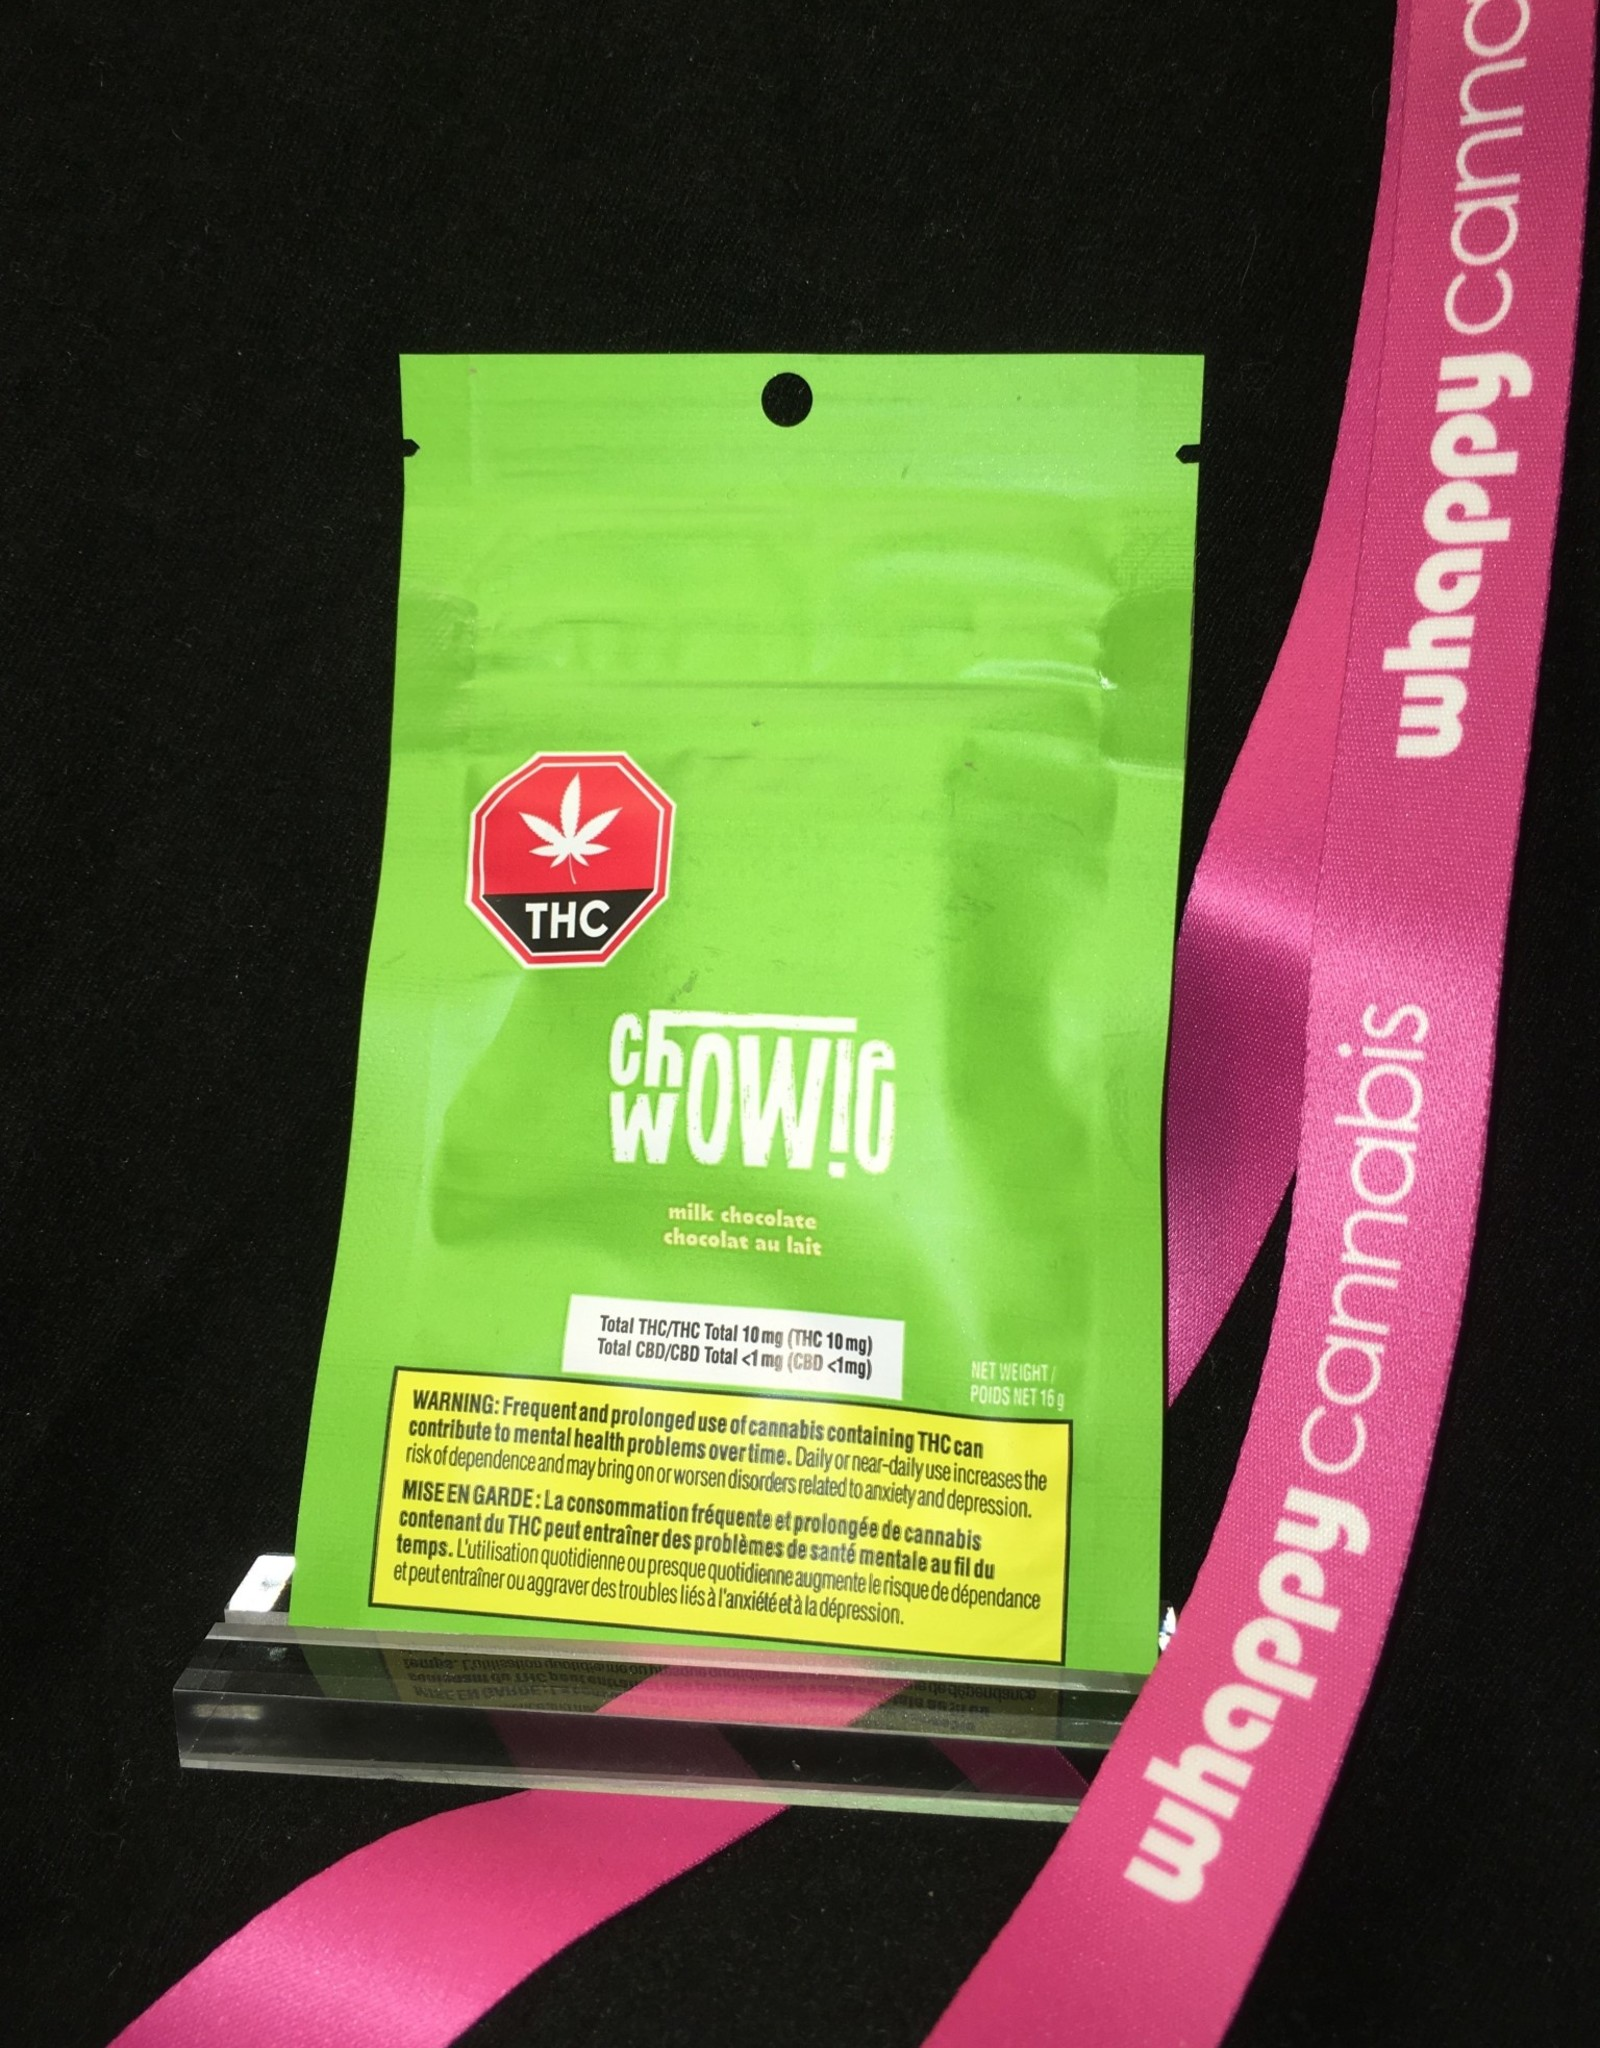 Chowie Wowie Chowie Wowie - THC Solid Milk Chocolate Blend 16g